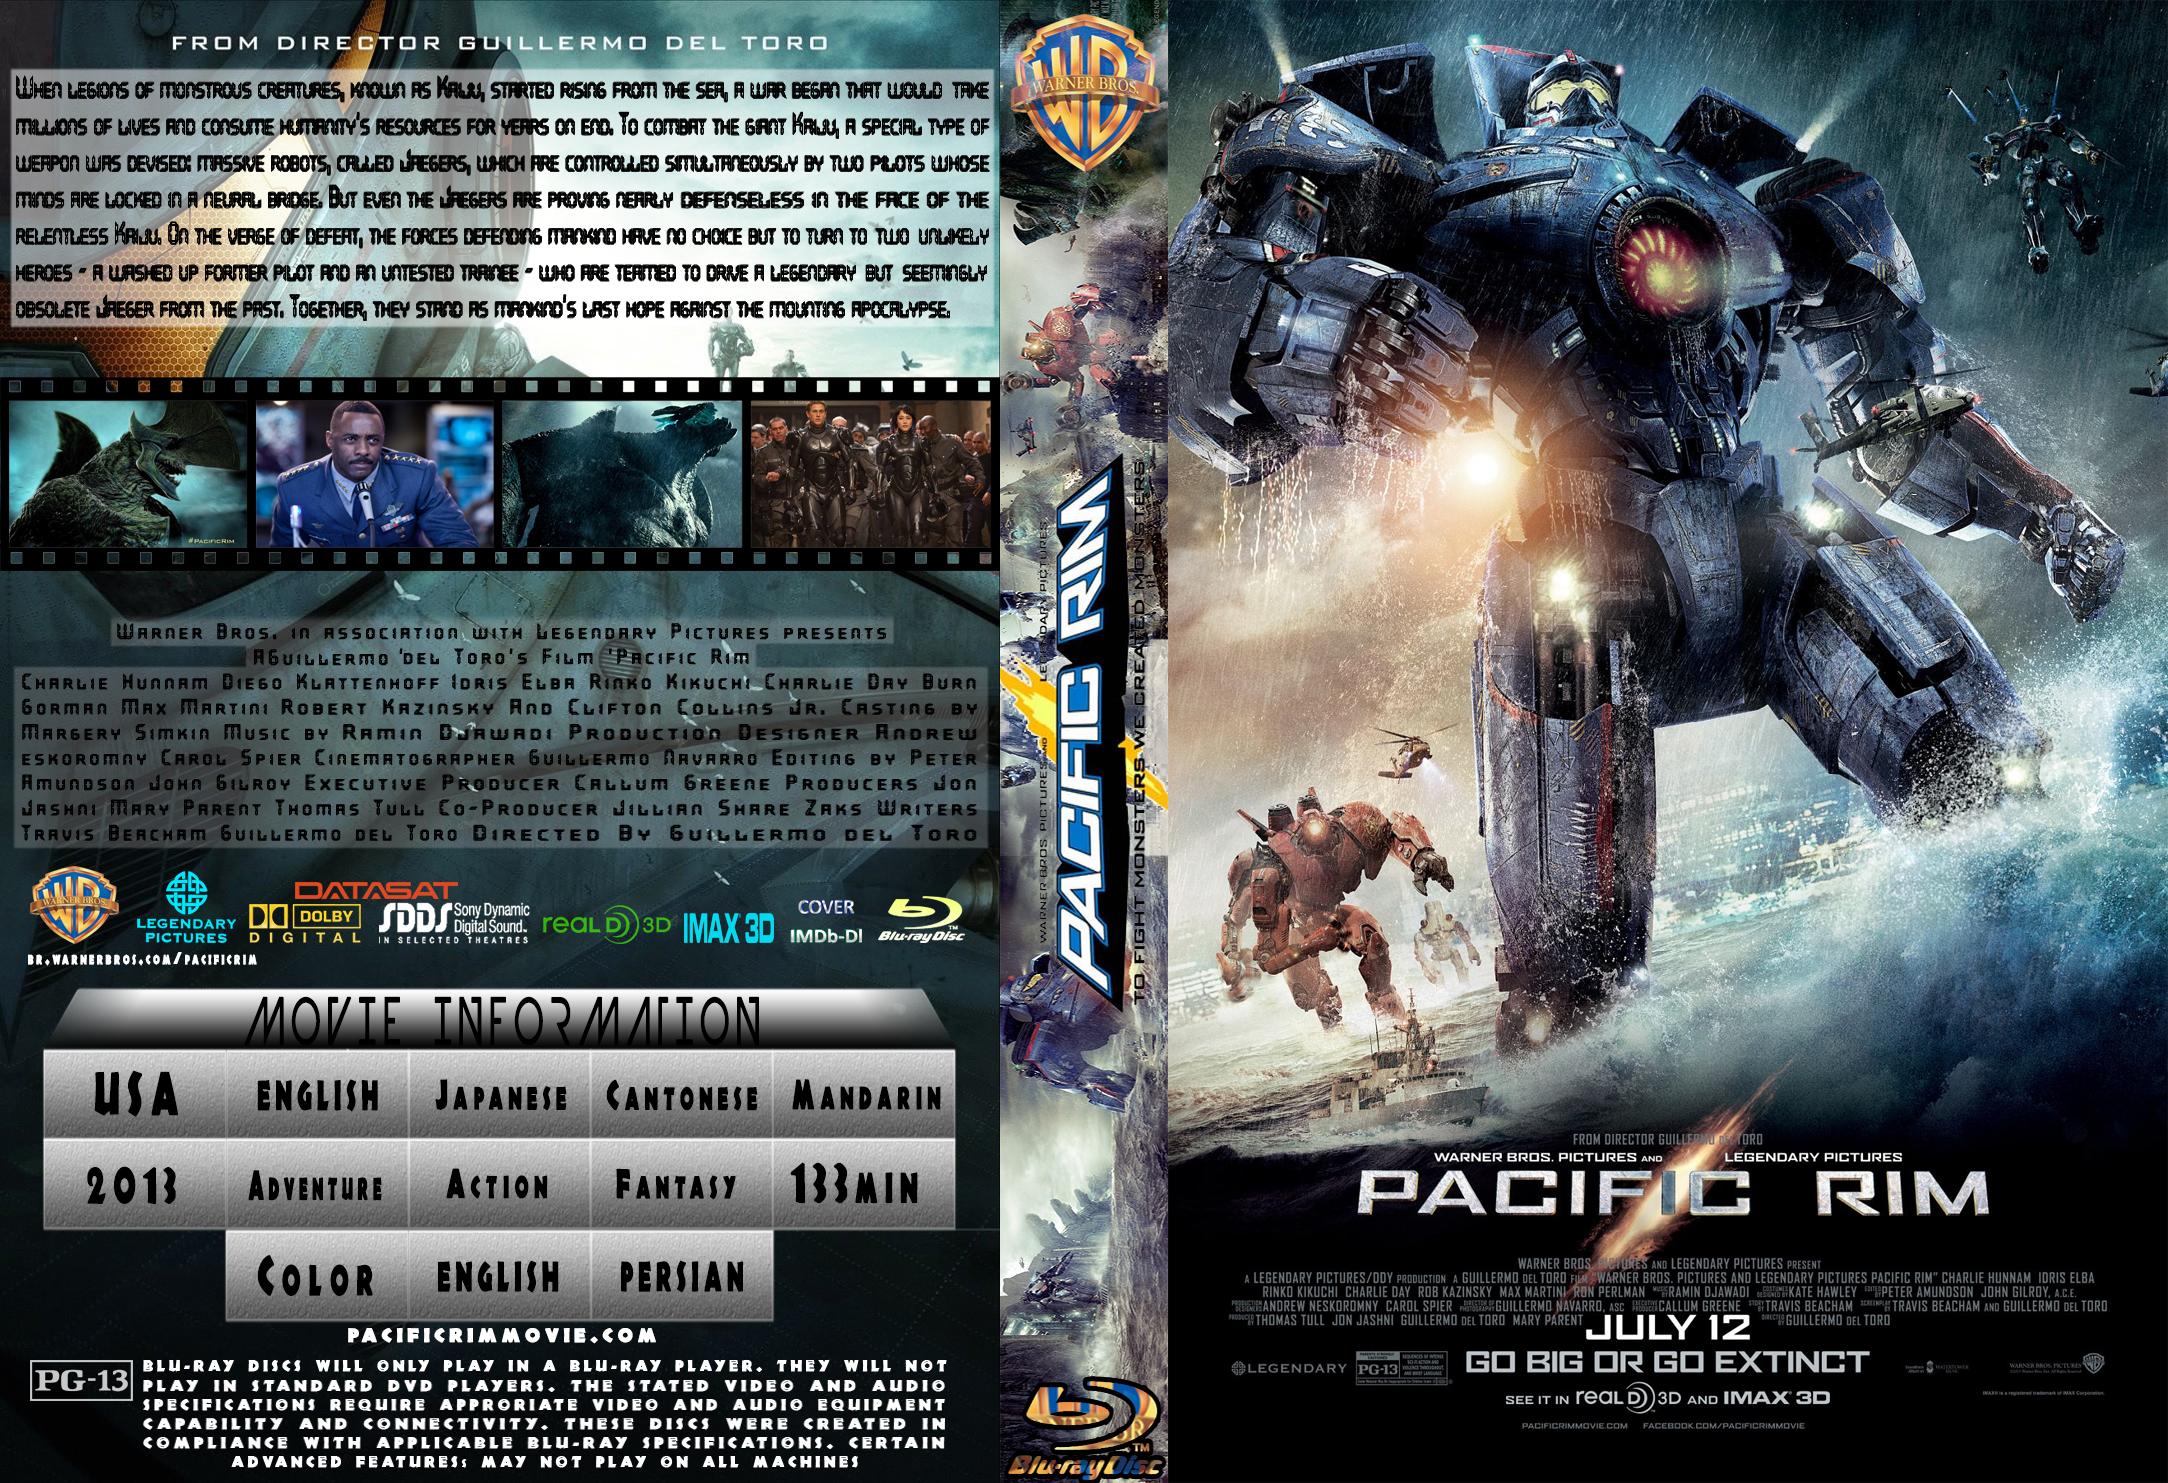 COVERS.BOX.SK ::: Pacific Rim 2013 [ IMDB-DL ] - high ... Pacific Rim Cover